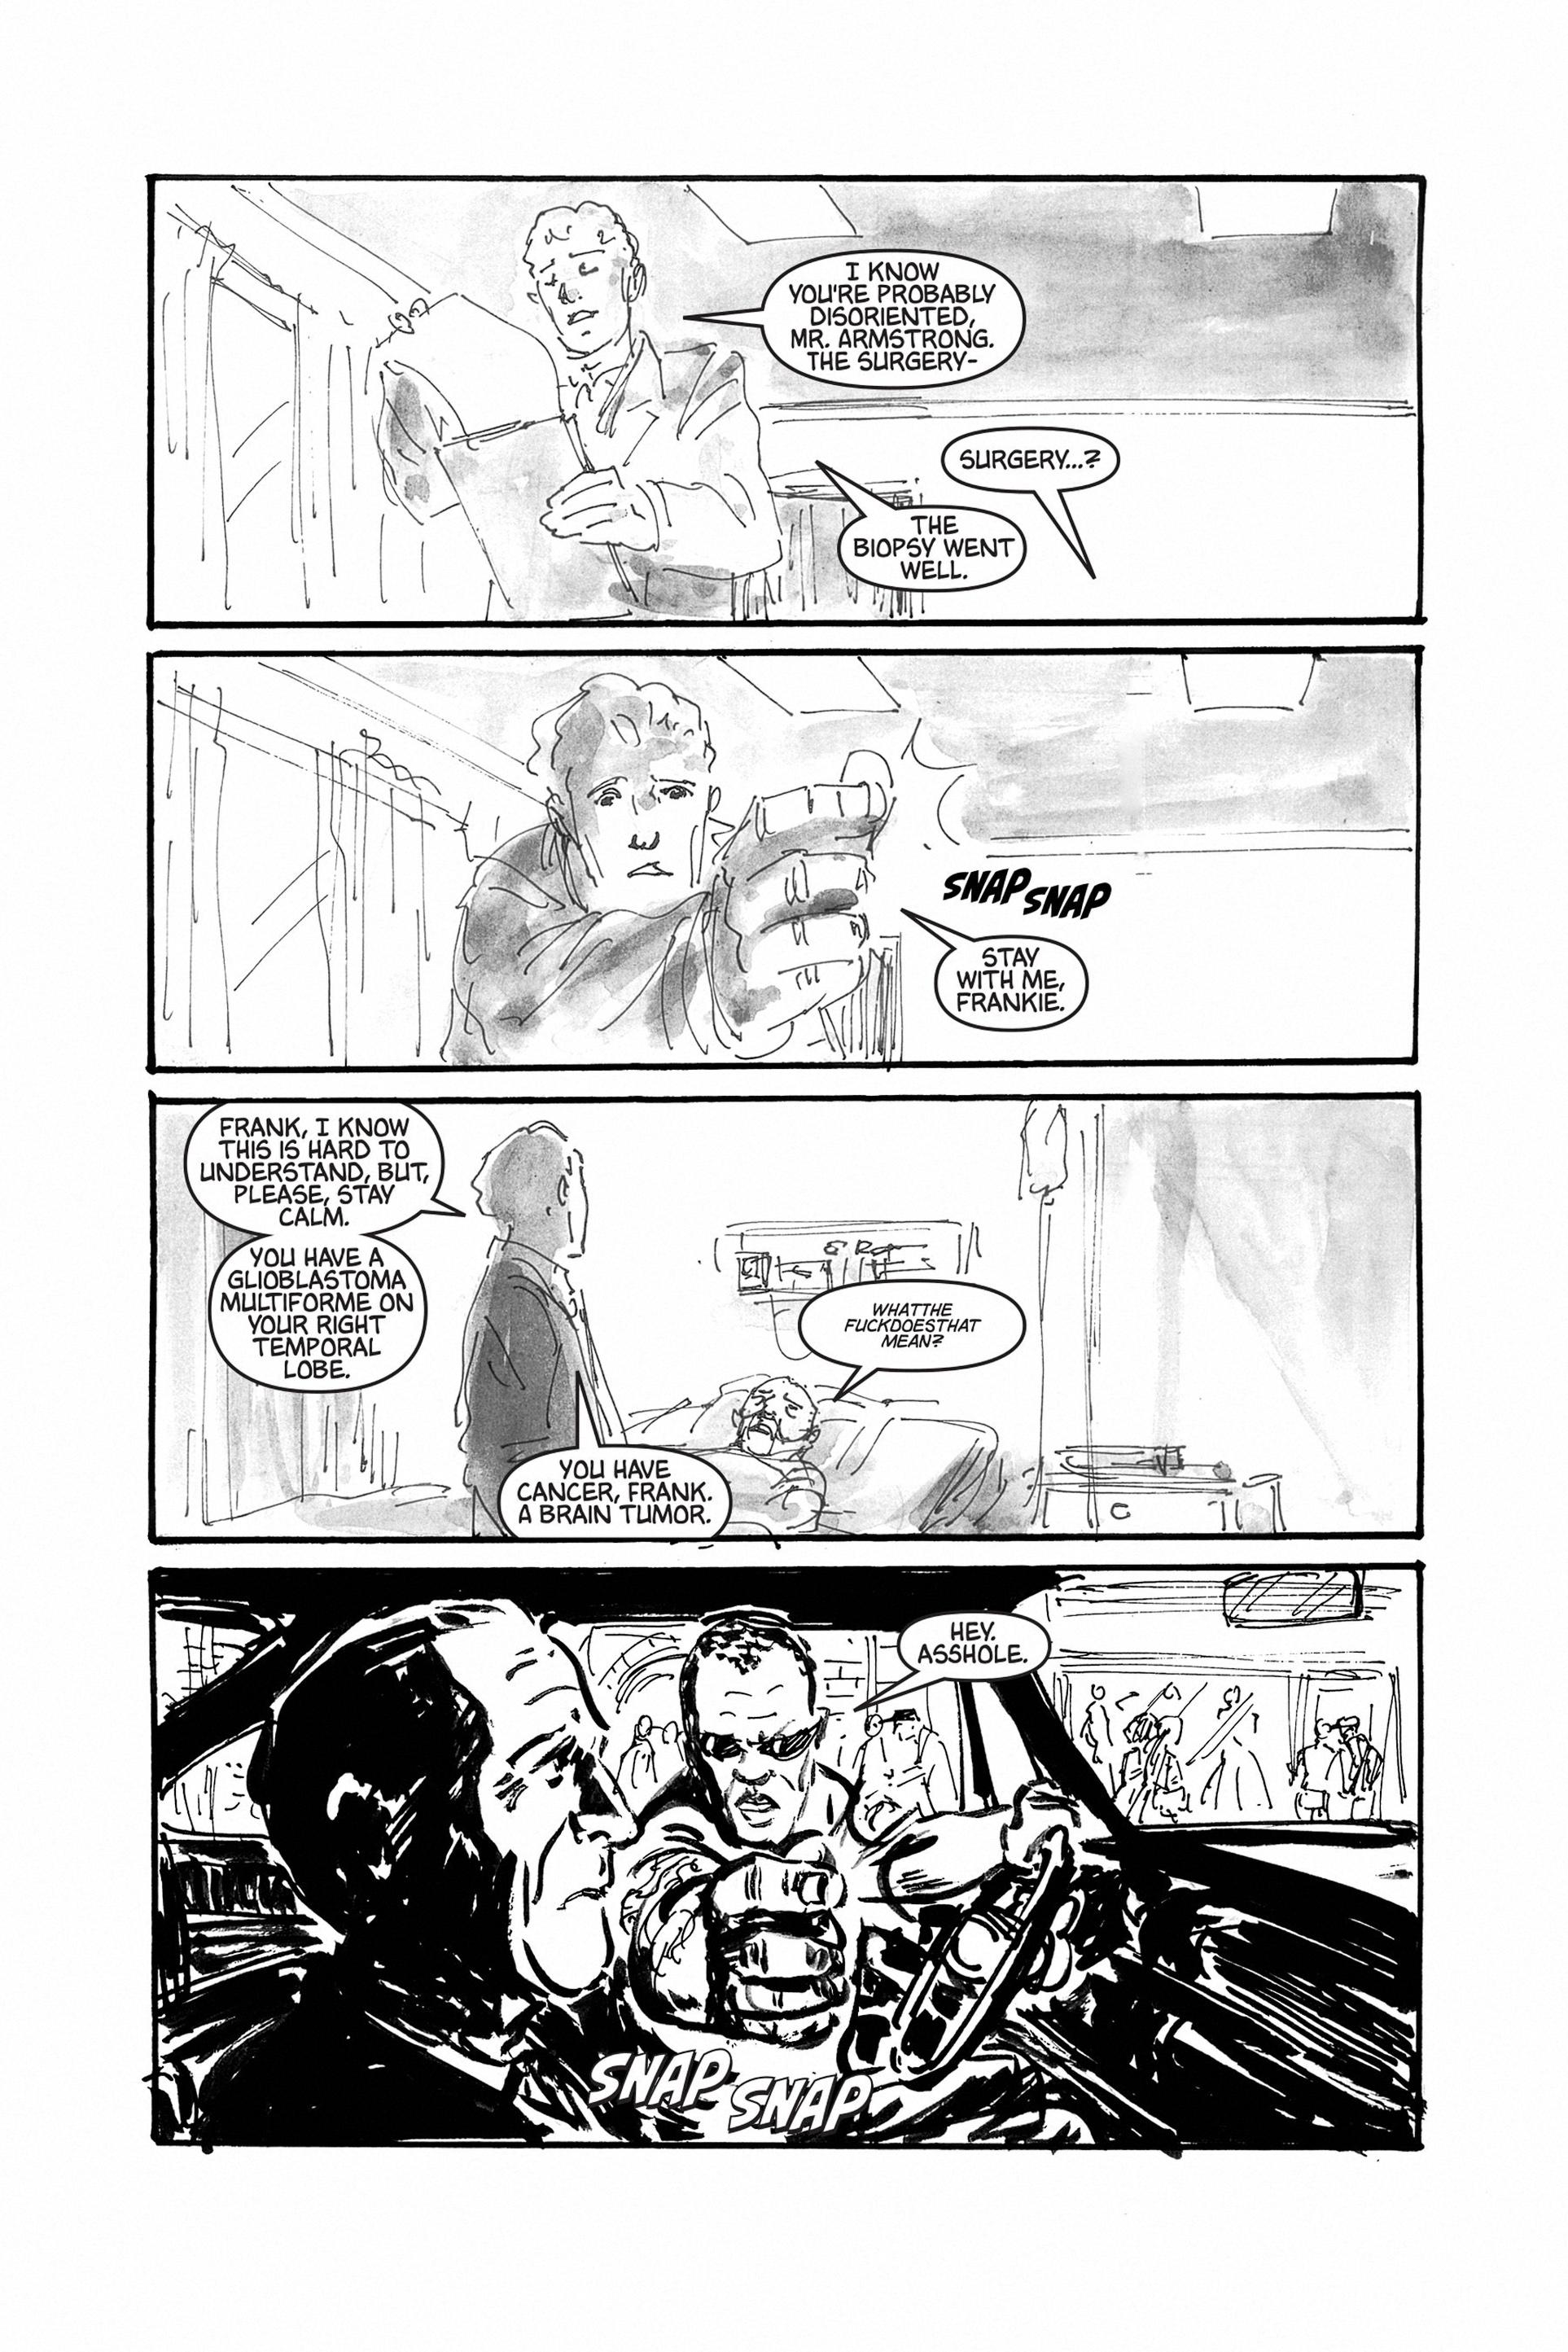 Read online Tumor comic -  Issue # TPB - 27